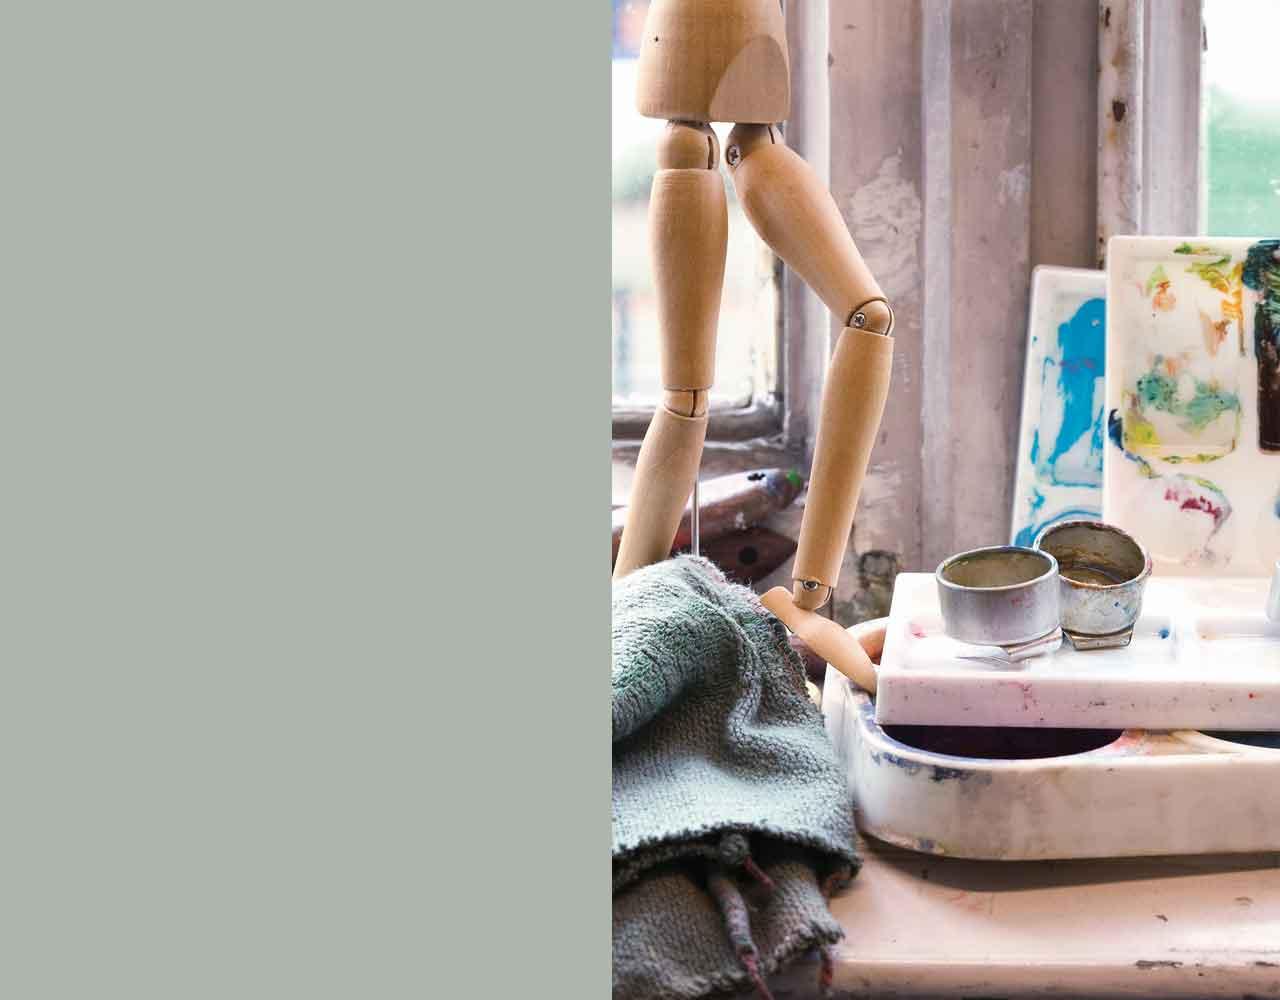 HomeBanners-Solid-Aksesouar-Zografikis-ARt&Colour